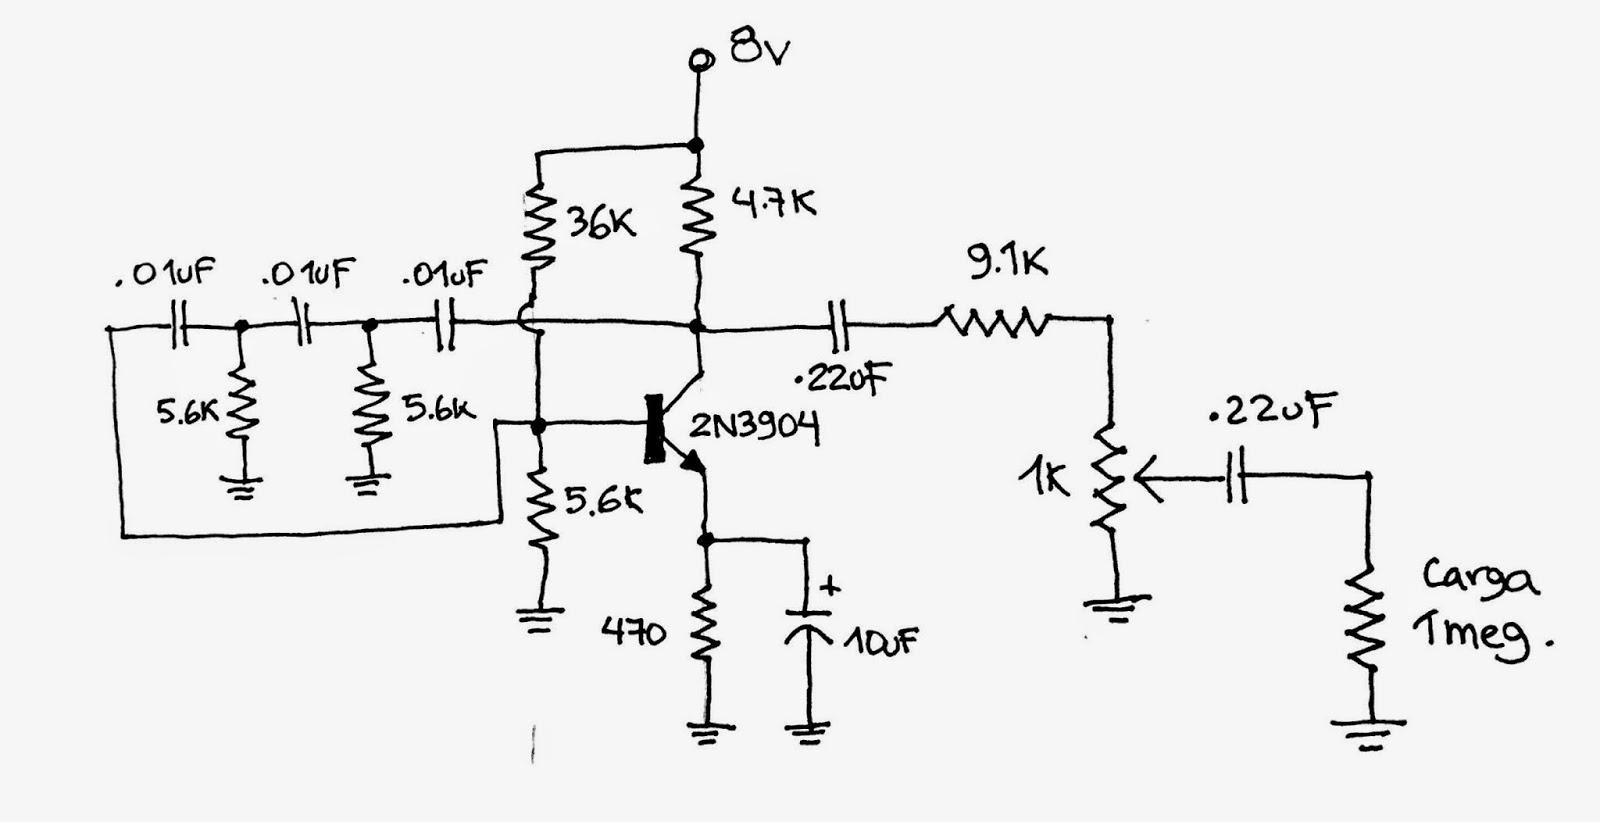 Circuito Oscilador : Insecto muerto oscilador de audio